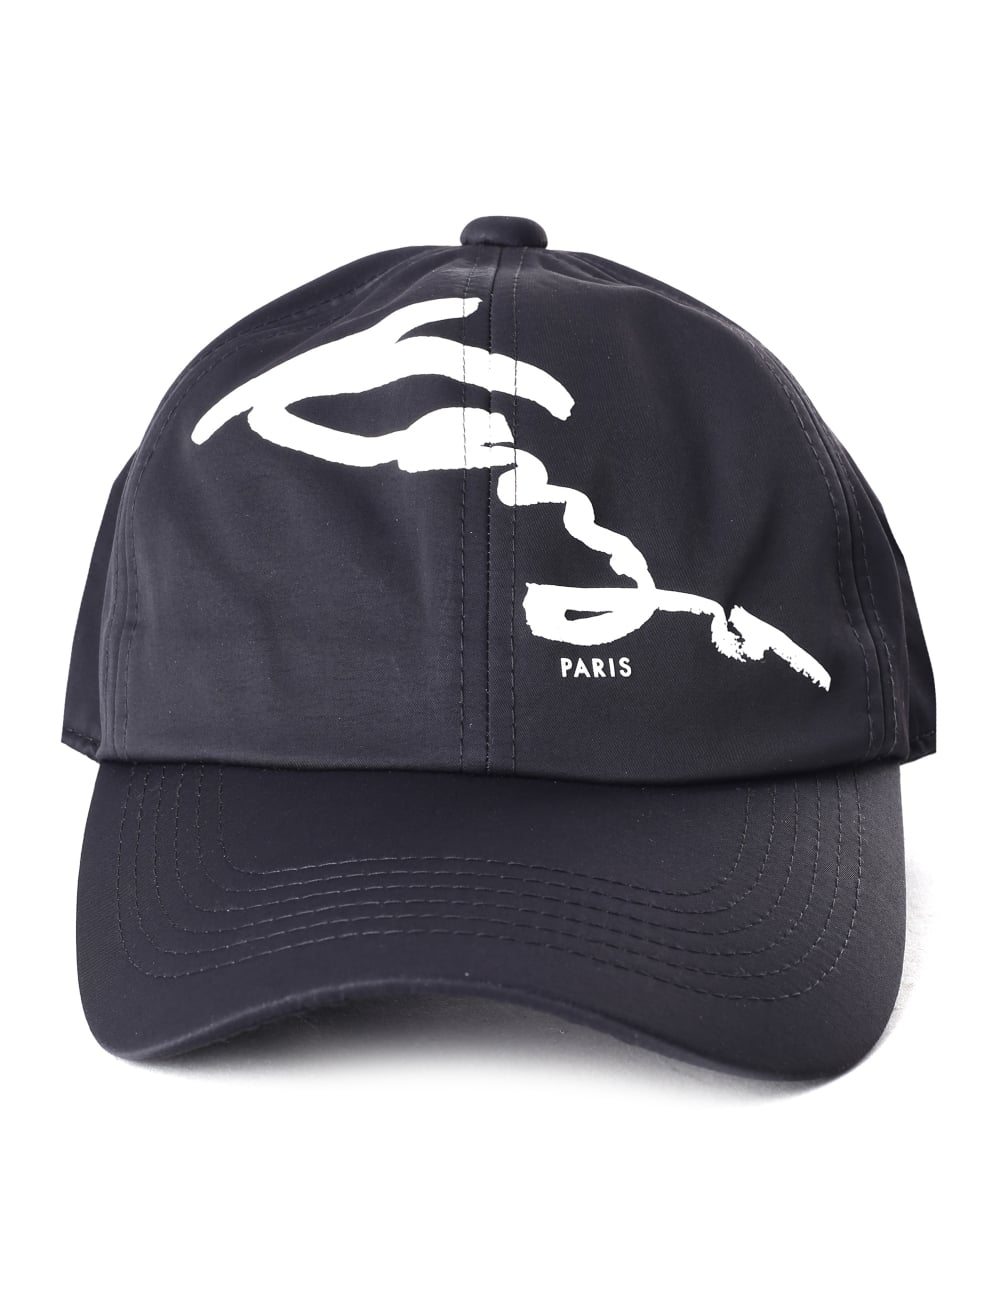 Kenzo Men s Signature Baseball Cap Black c639896d598